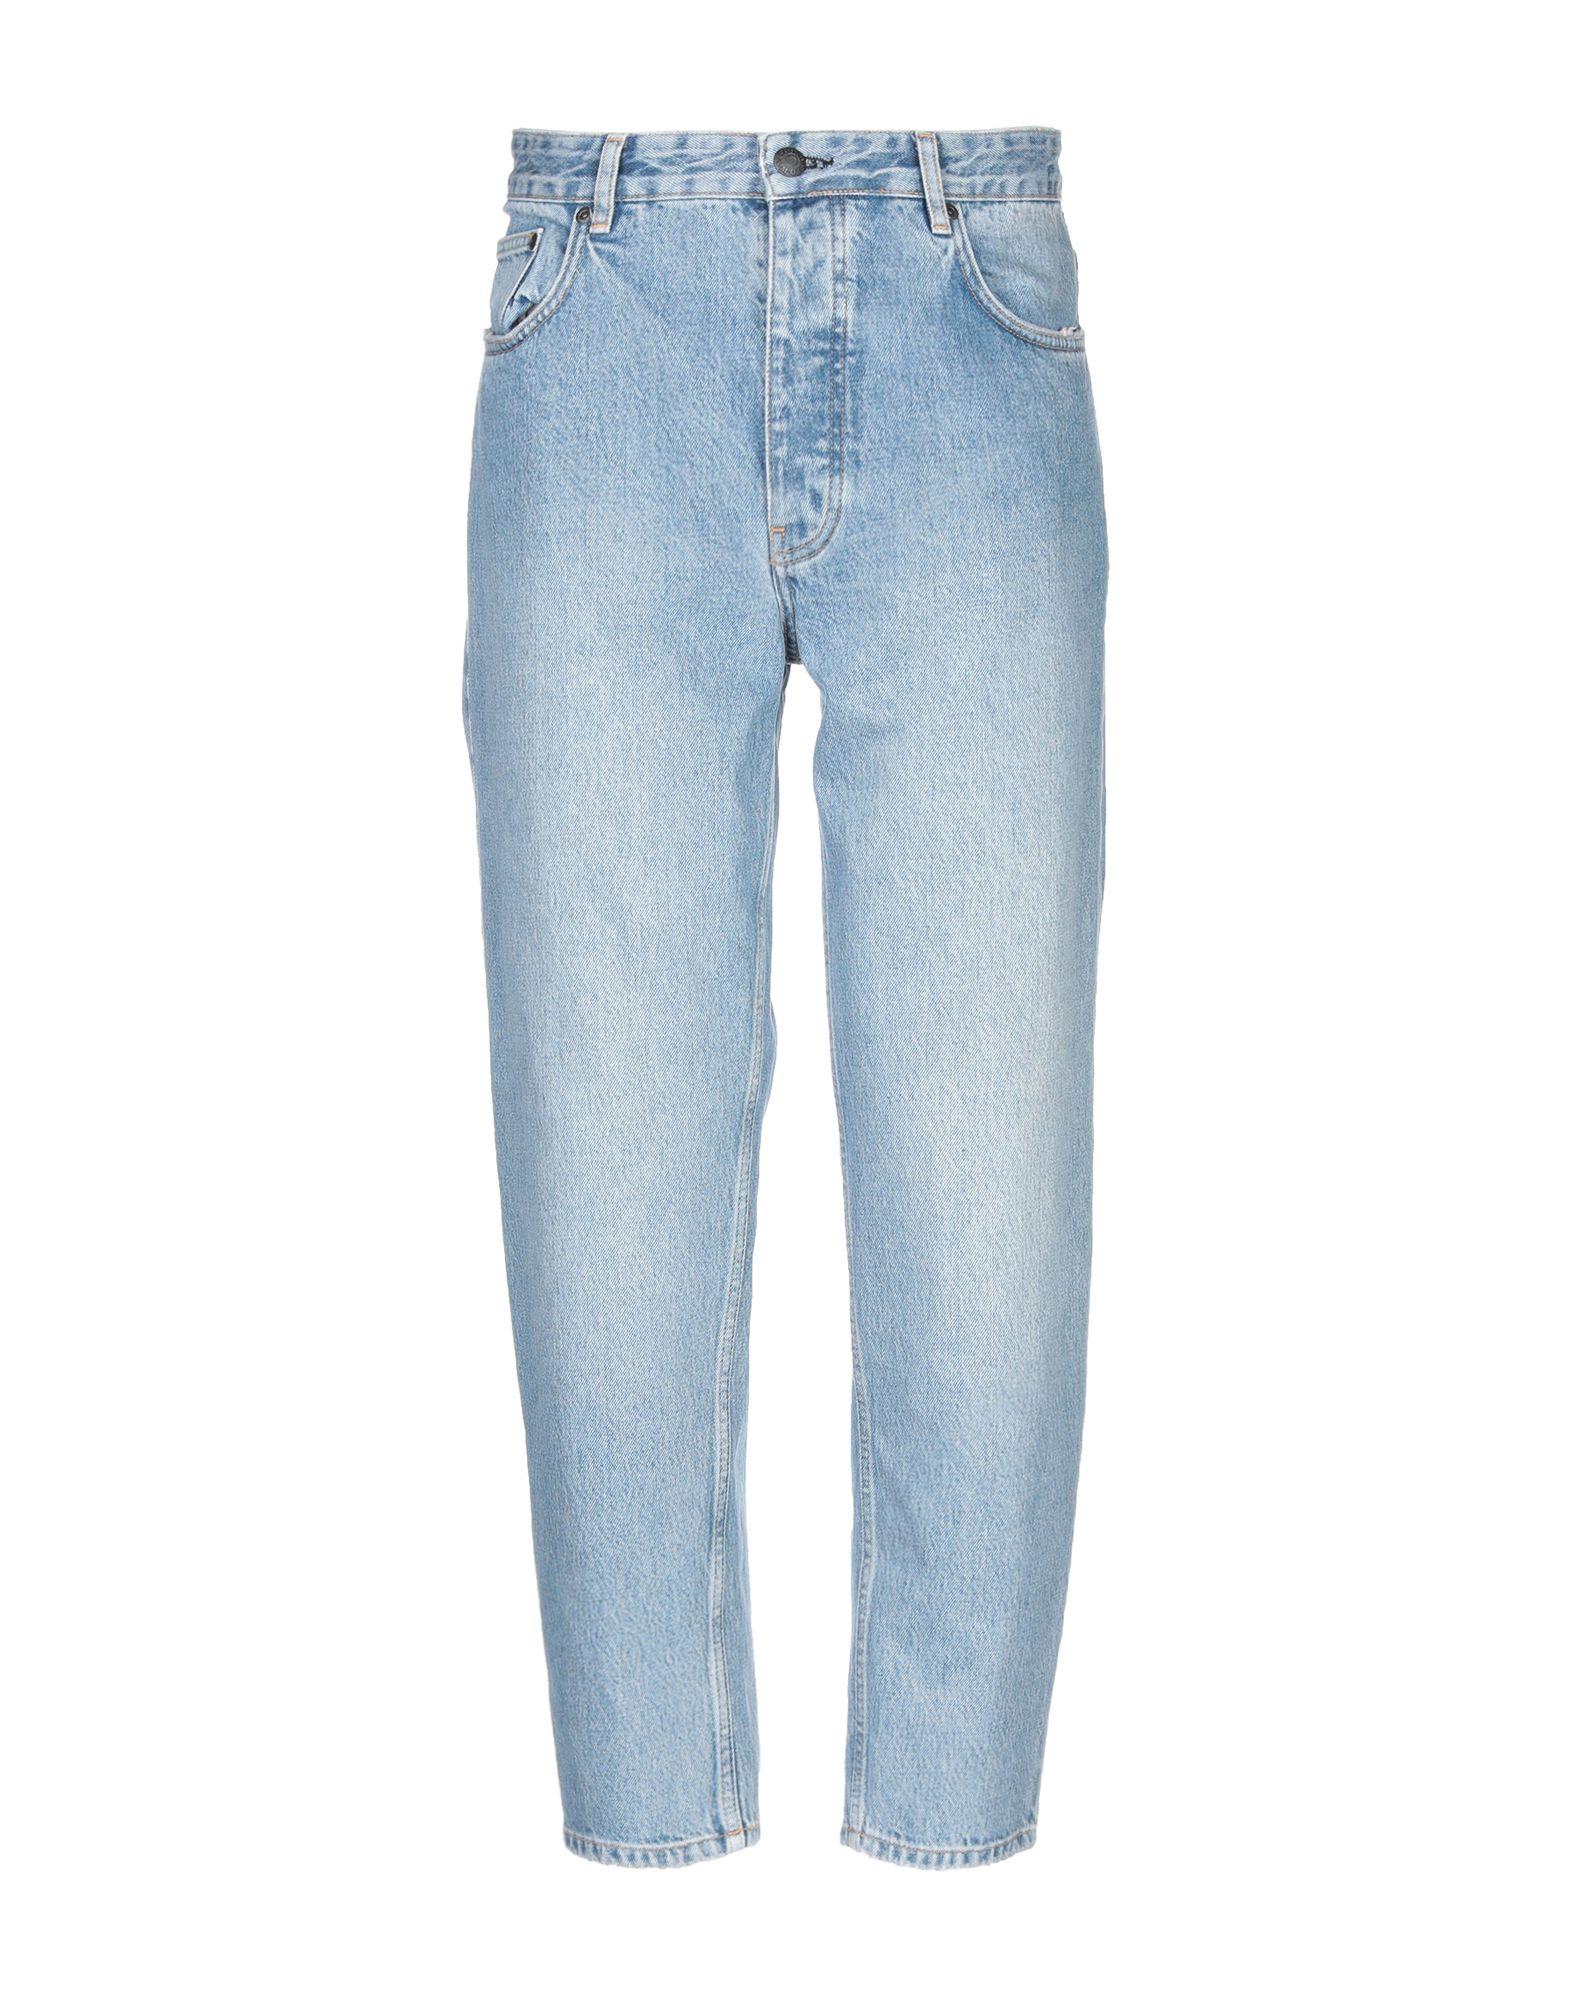 WON HUNDRED Джинсовые брюки bergler divorce won t help paper